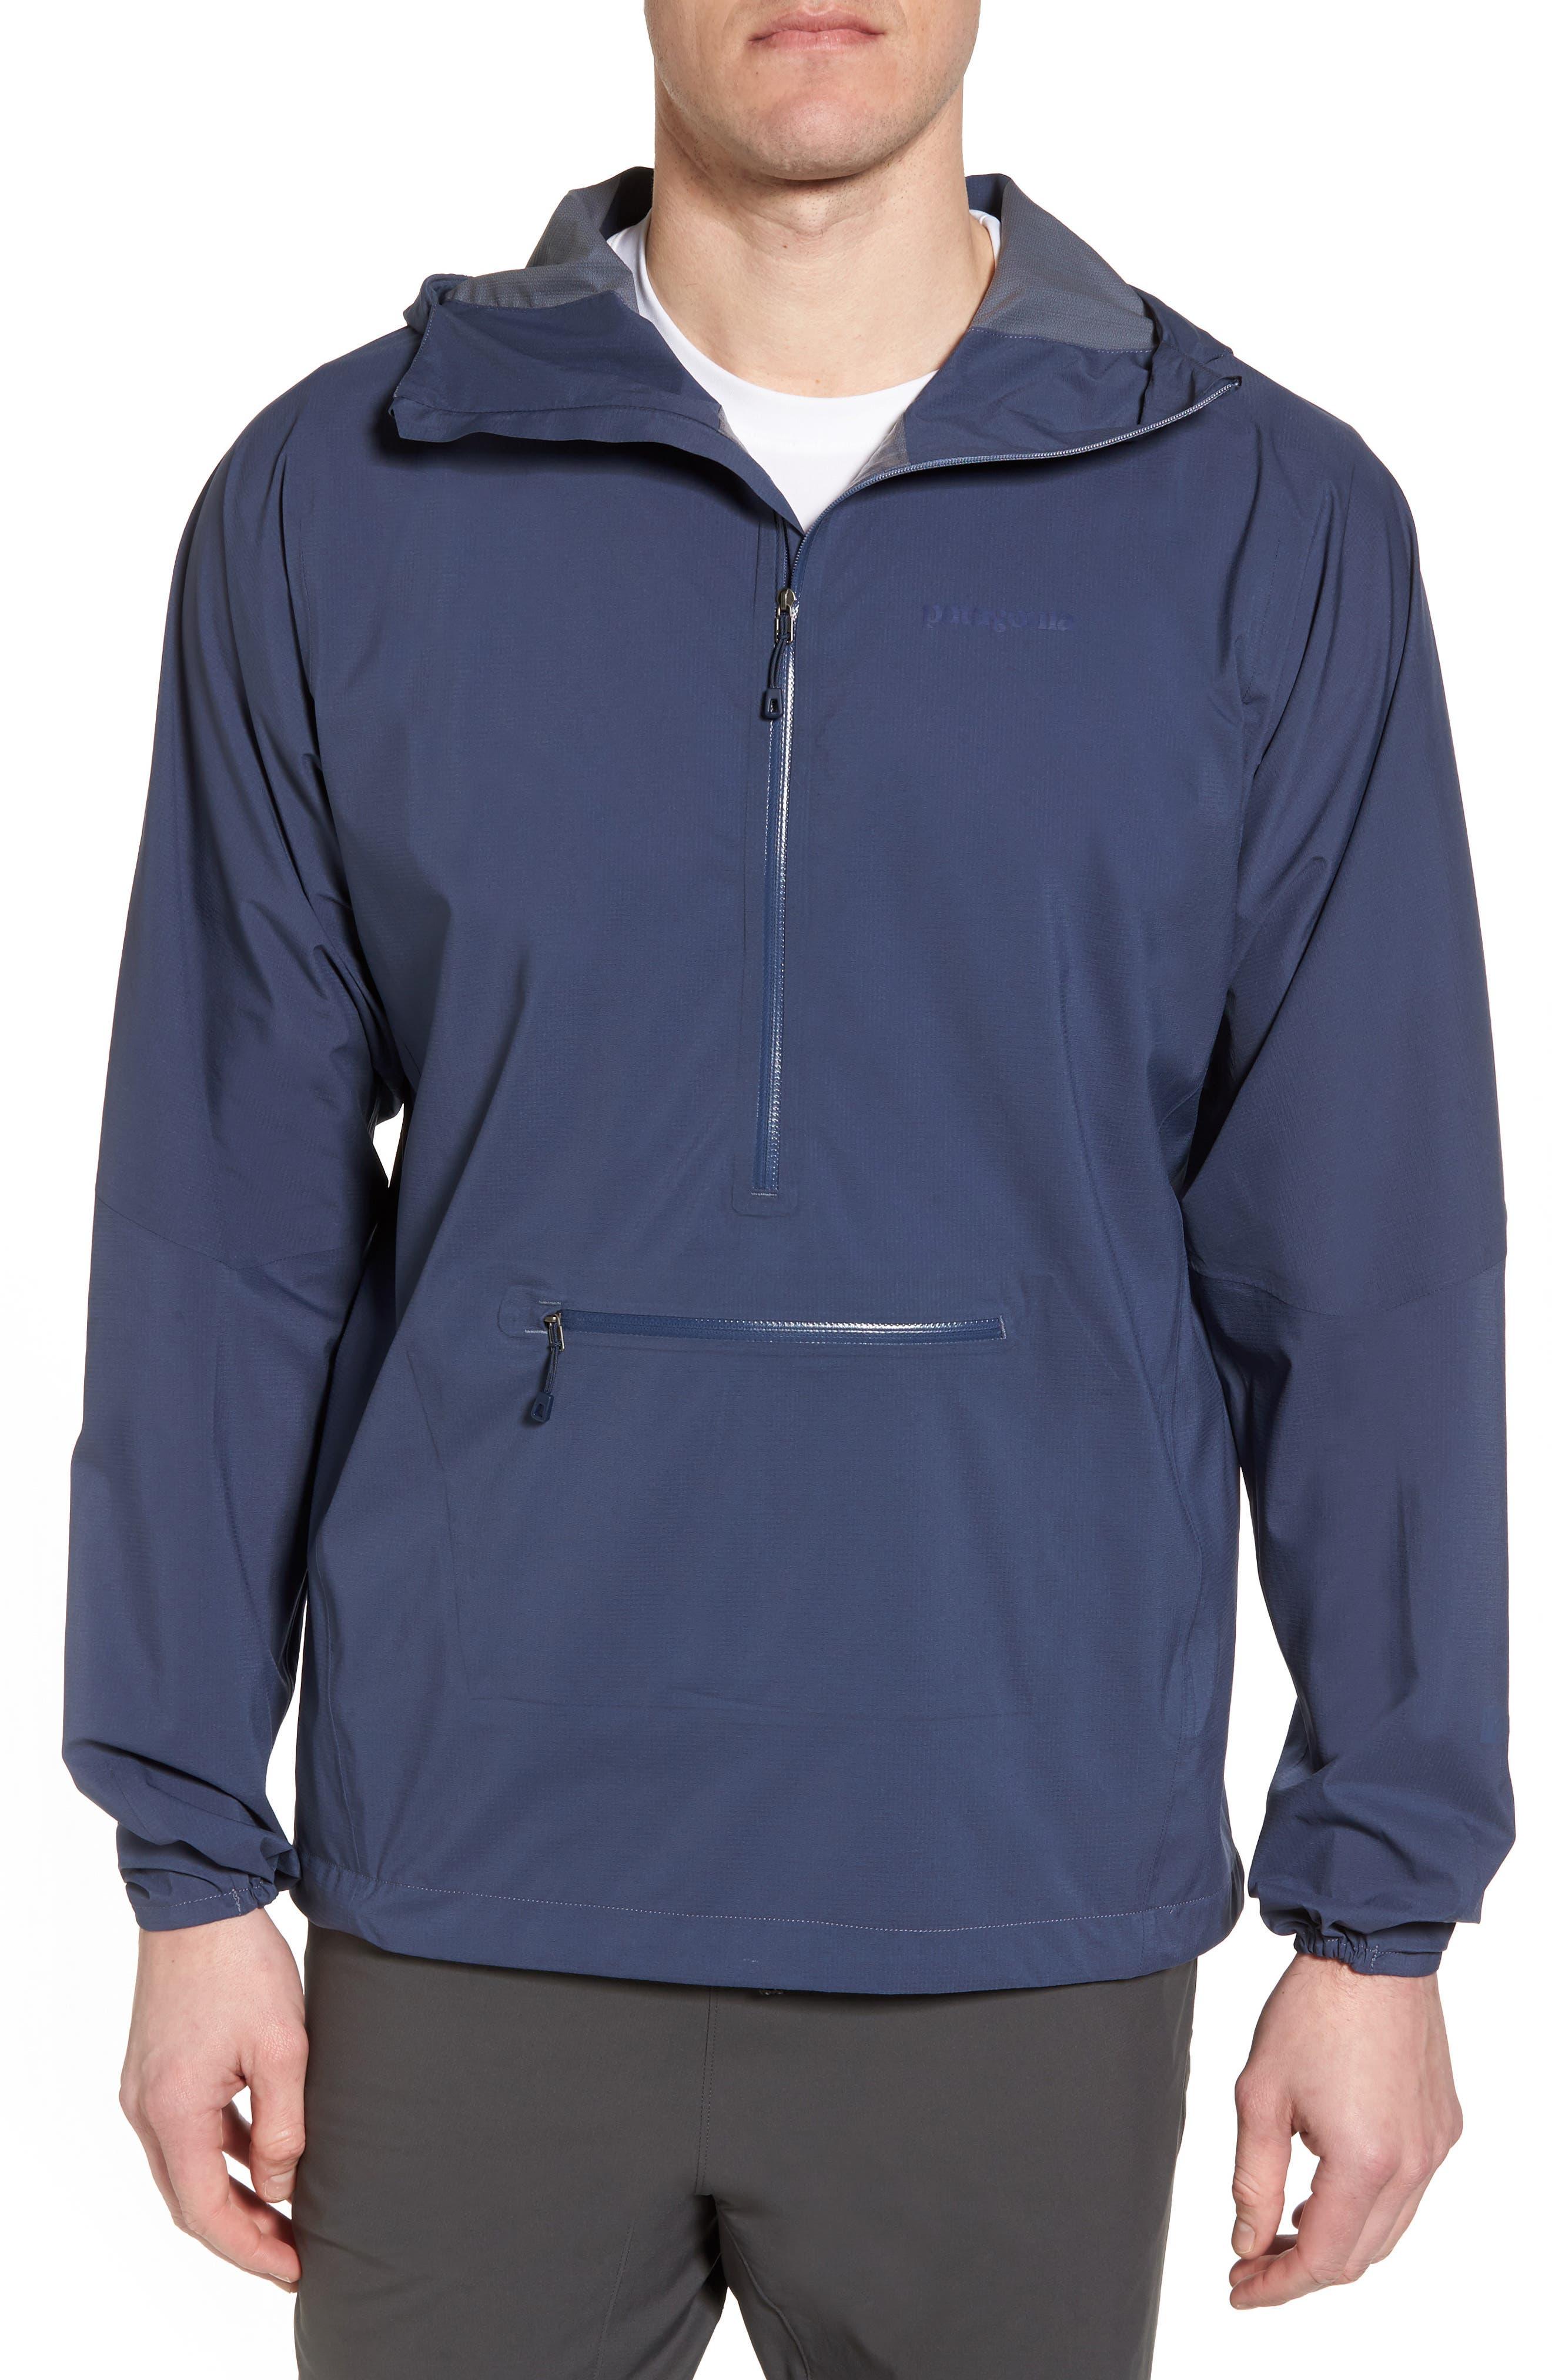 Stretch Rainshadow Jacket,                             Main thumbnail 1, color,                             Dolomite Blue